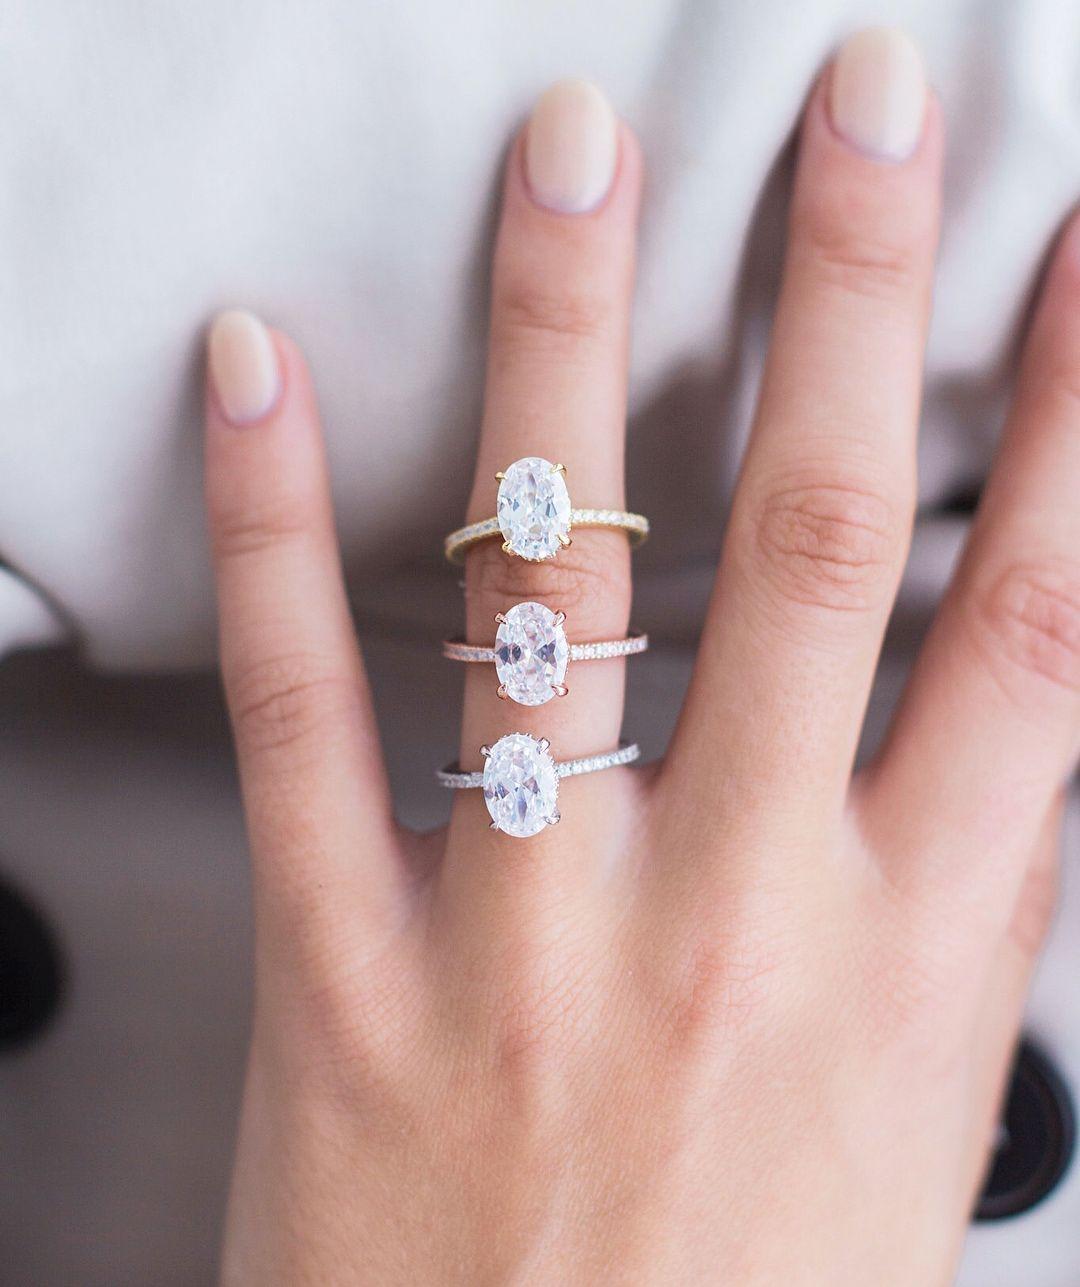 Pin by veronica burnett on future wedding ideas in 2018 | Pinterest ...